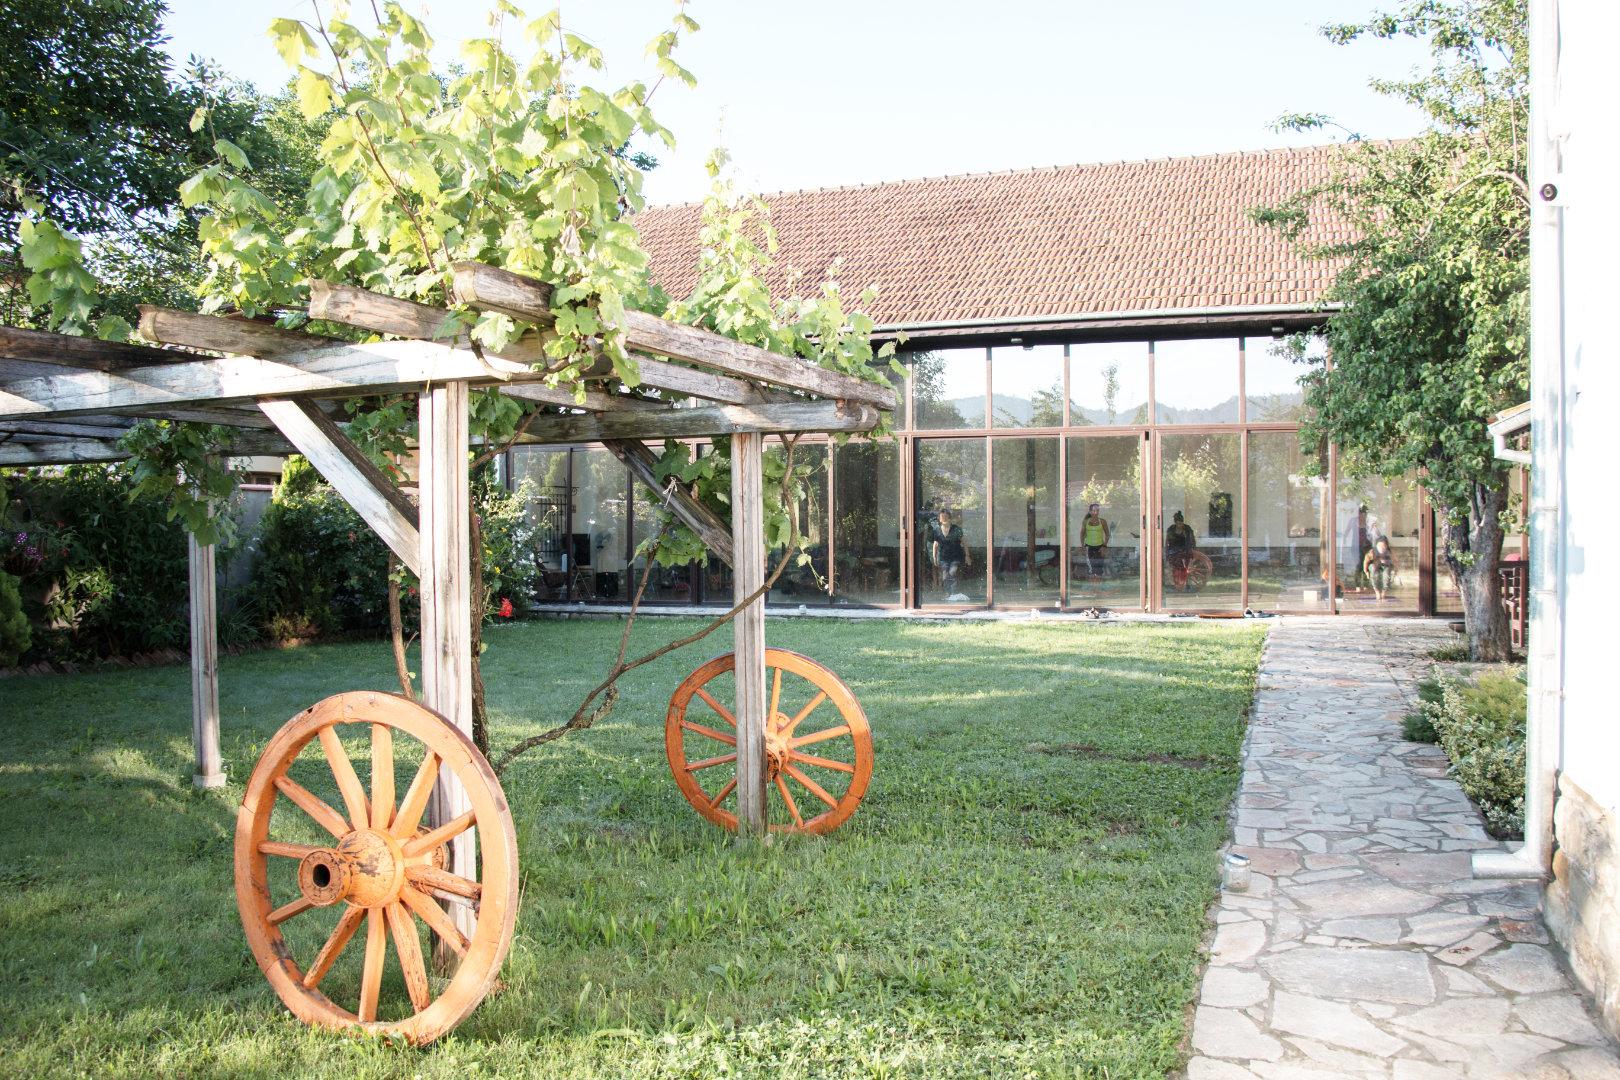 Garden view of our yoga center in Veliko Tarnovo Bulgaria